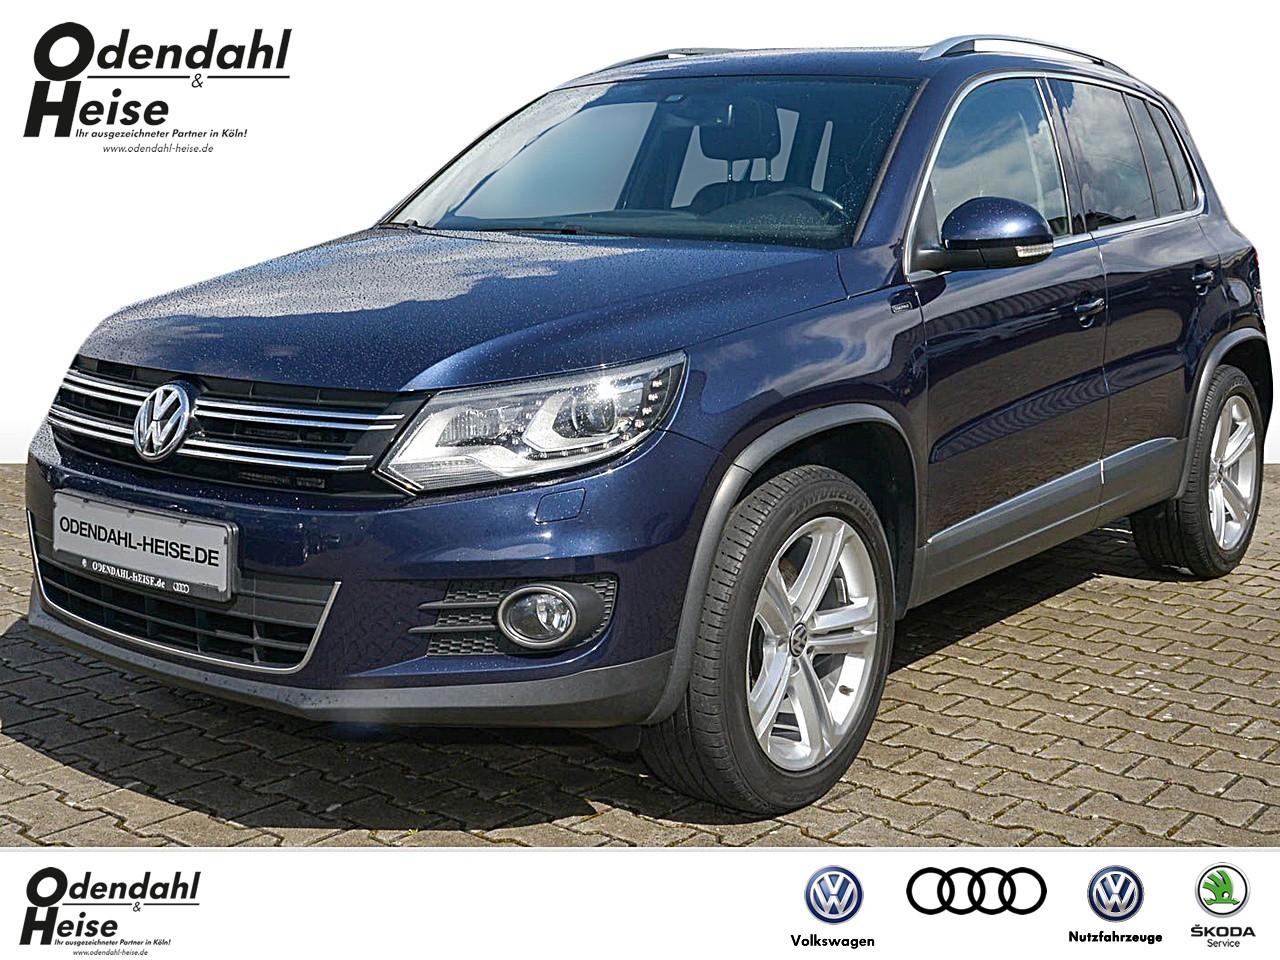 Volkswagen Tiguan 2,0 l TDI EU6 110 KW 7-Gang DSG 2.0 TDI BMT 4-Motion DSG LOUNGE Xenon Navi PDC Kamera Panorama, Jahr 2015, Diesel